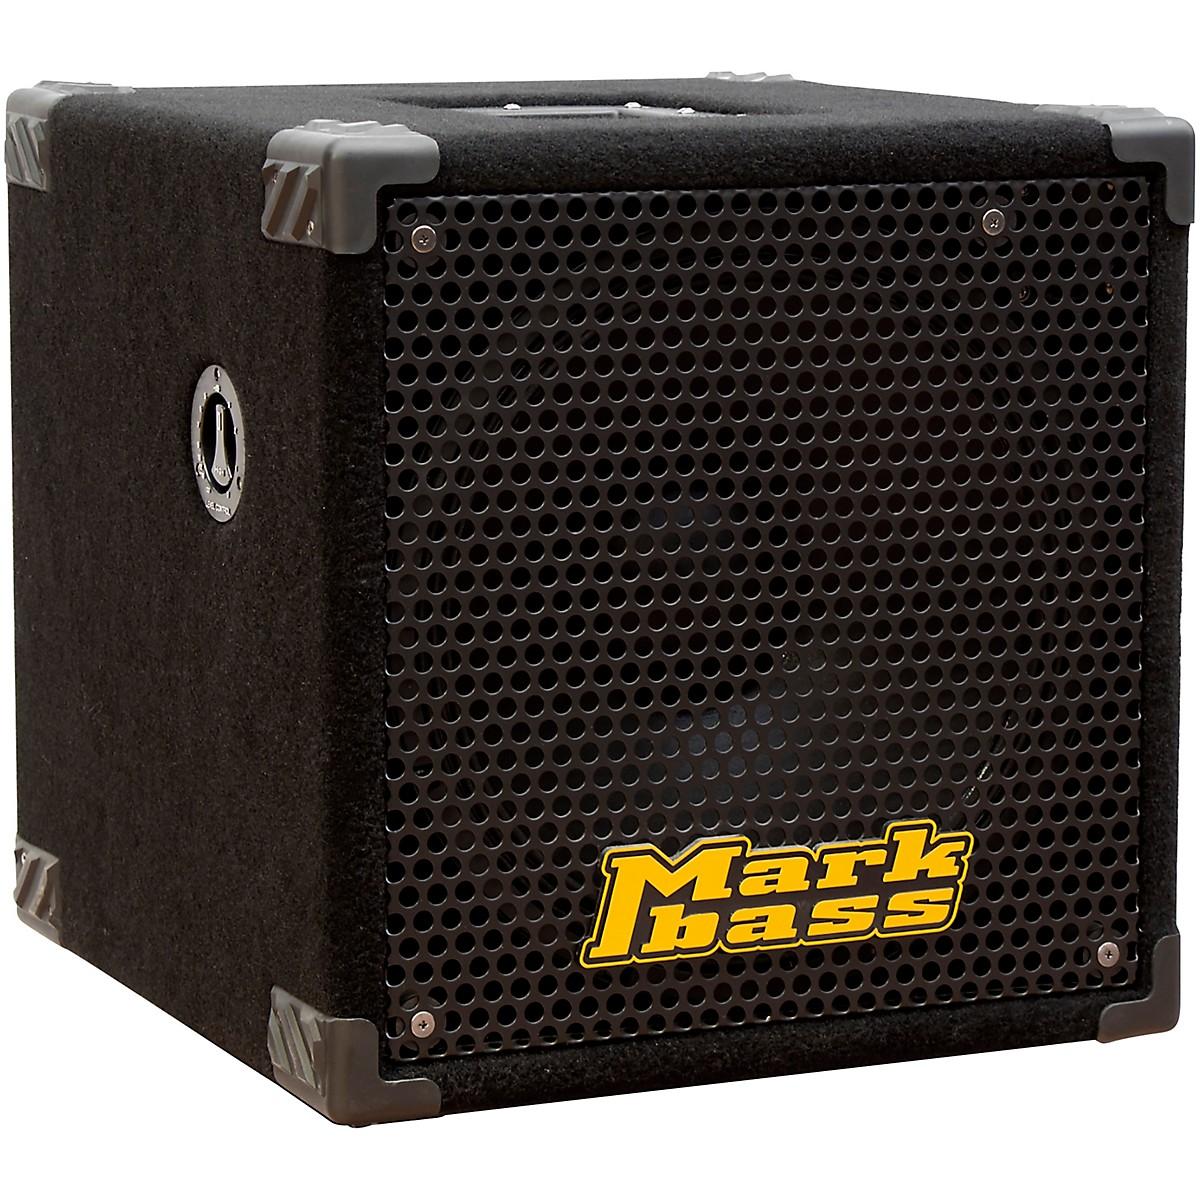 Markbass New York 151 Black 300W 1x15 Bass Speaker Cabinet